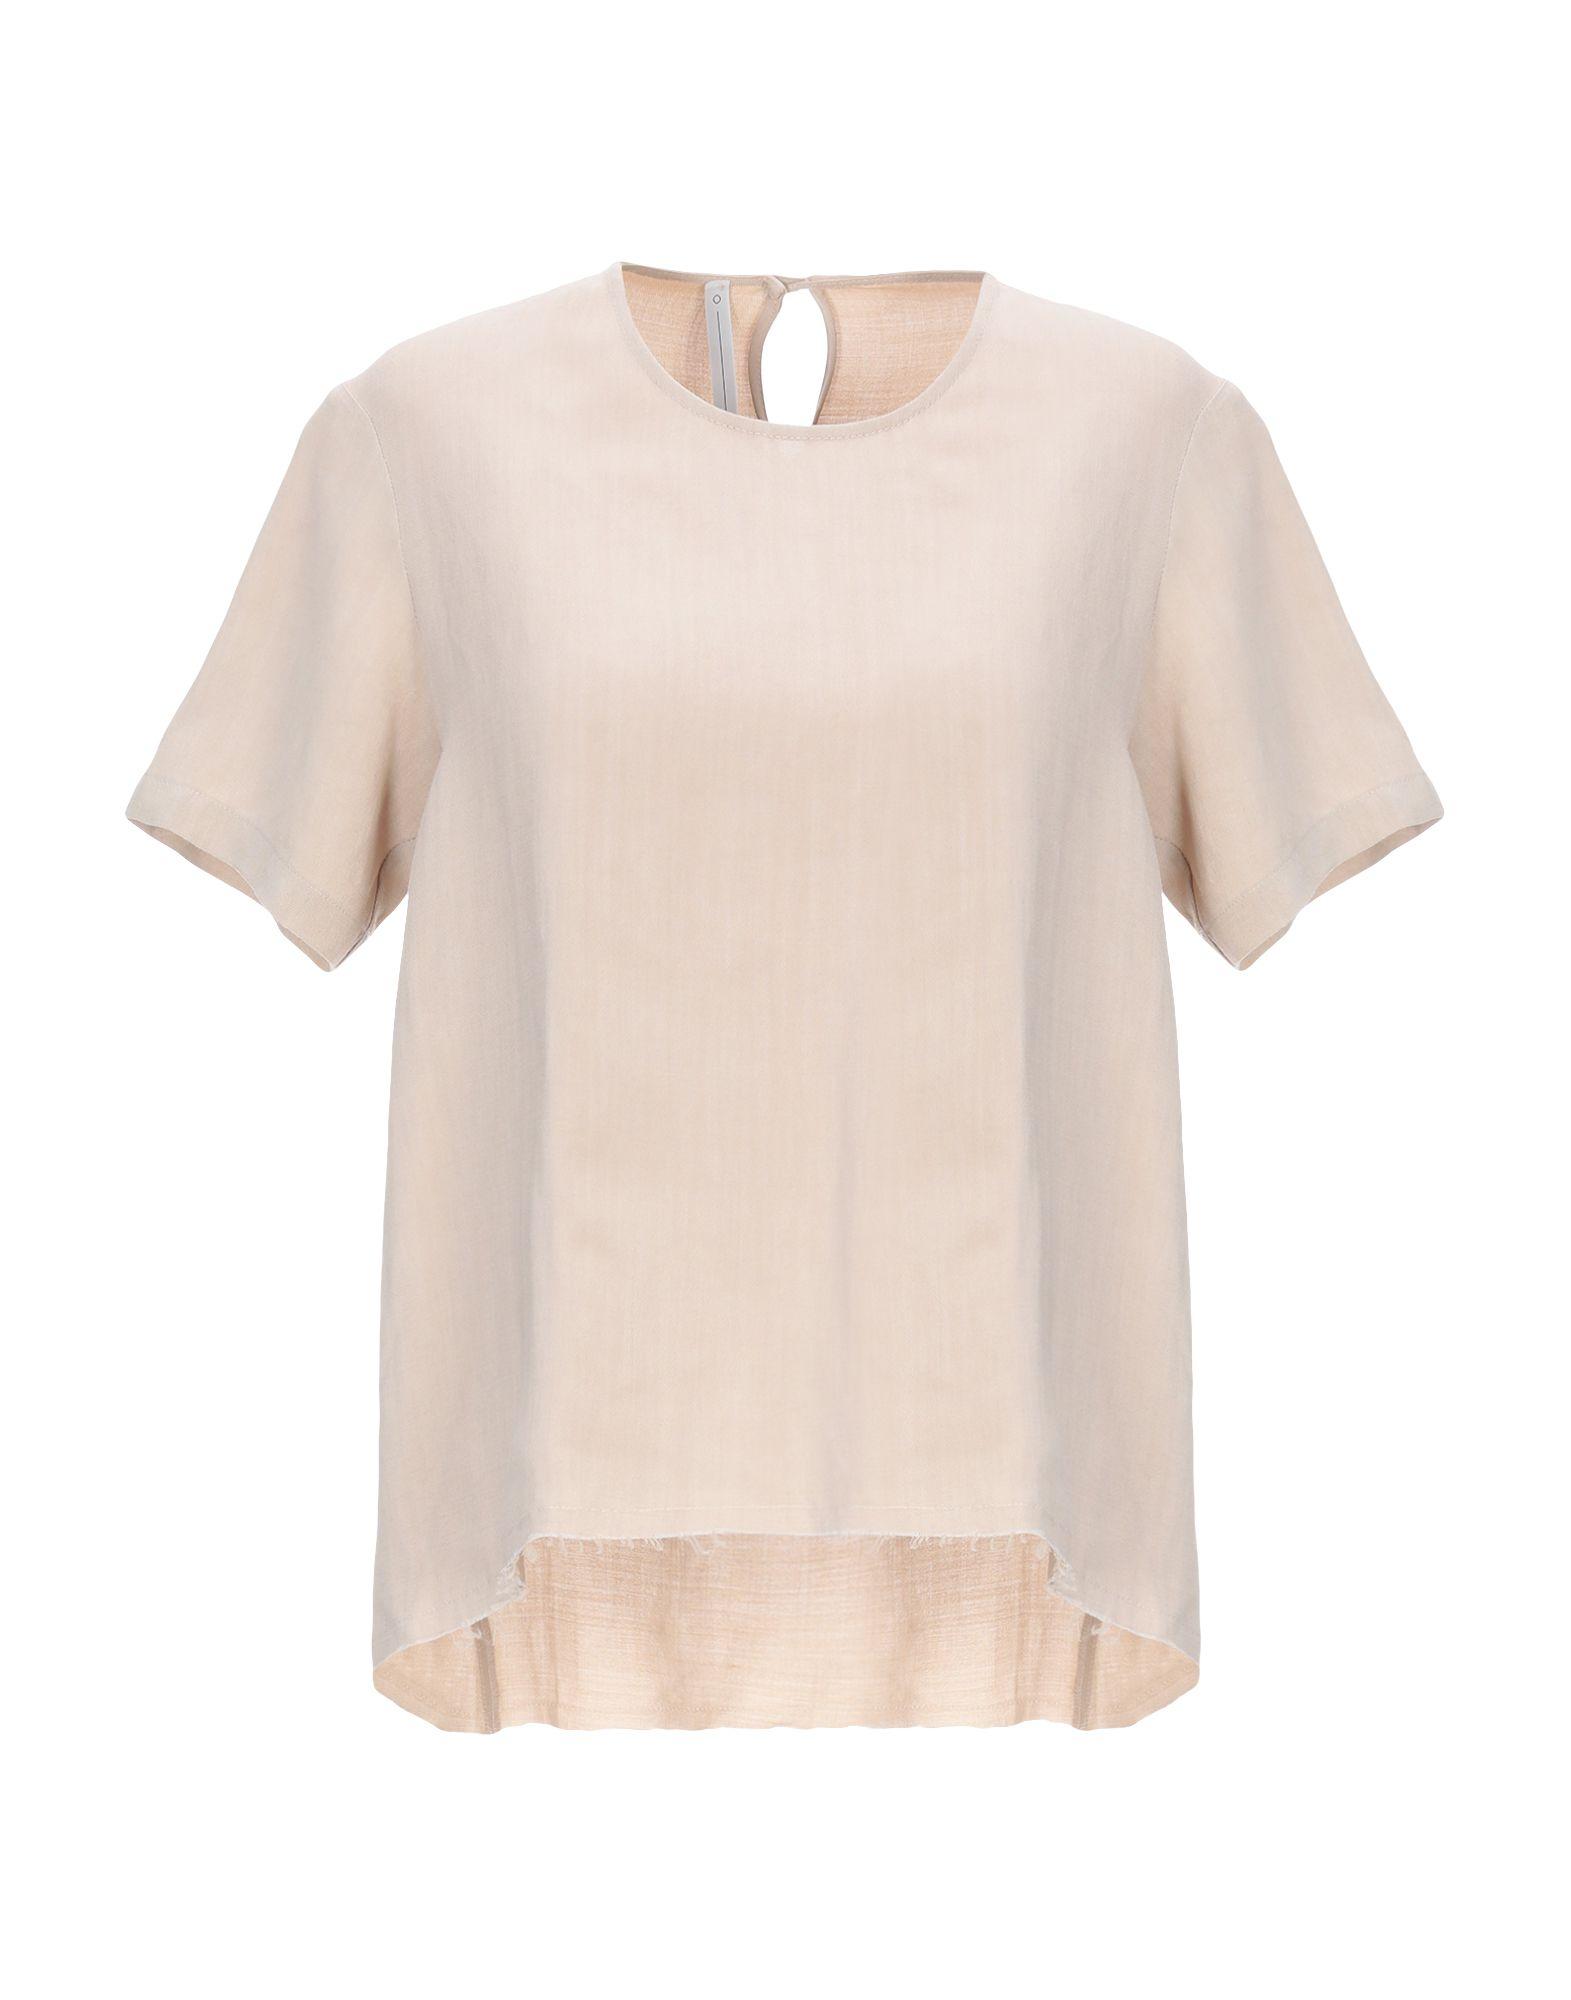 SERIE N°UMERICA Блузка блузка с рисунком короткие рукава вырез сзади